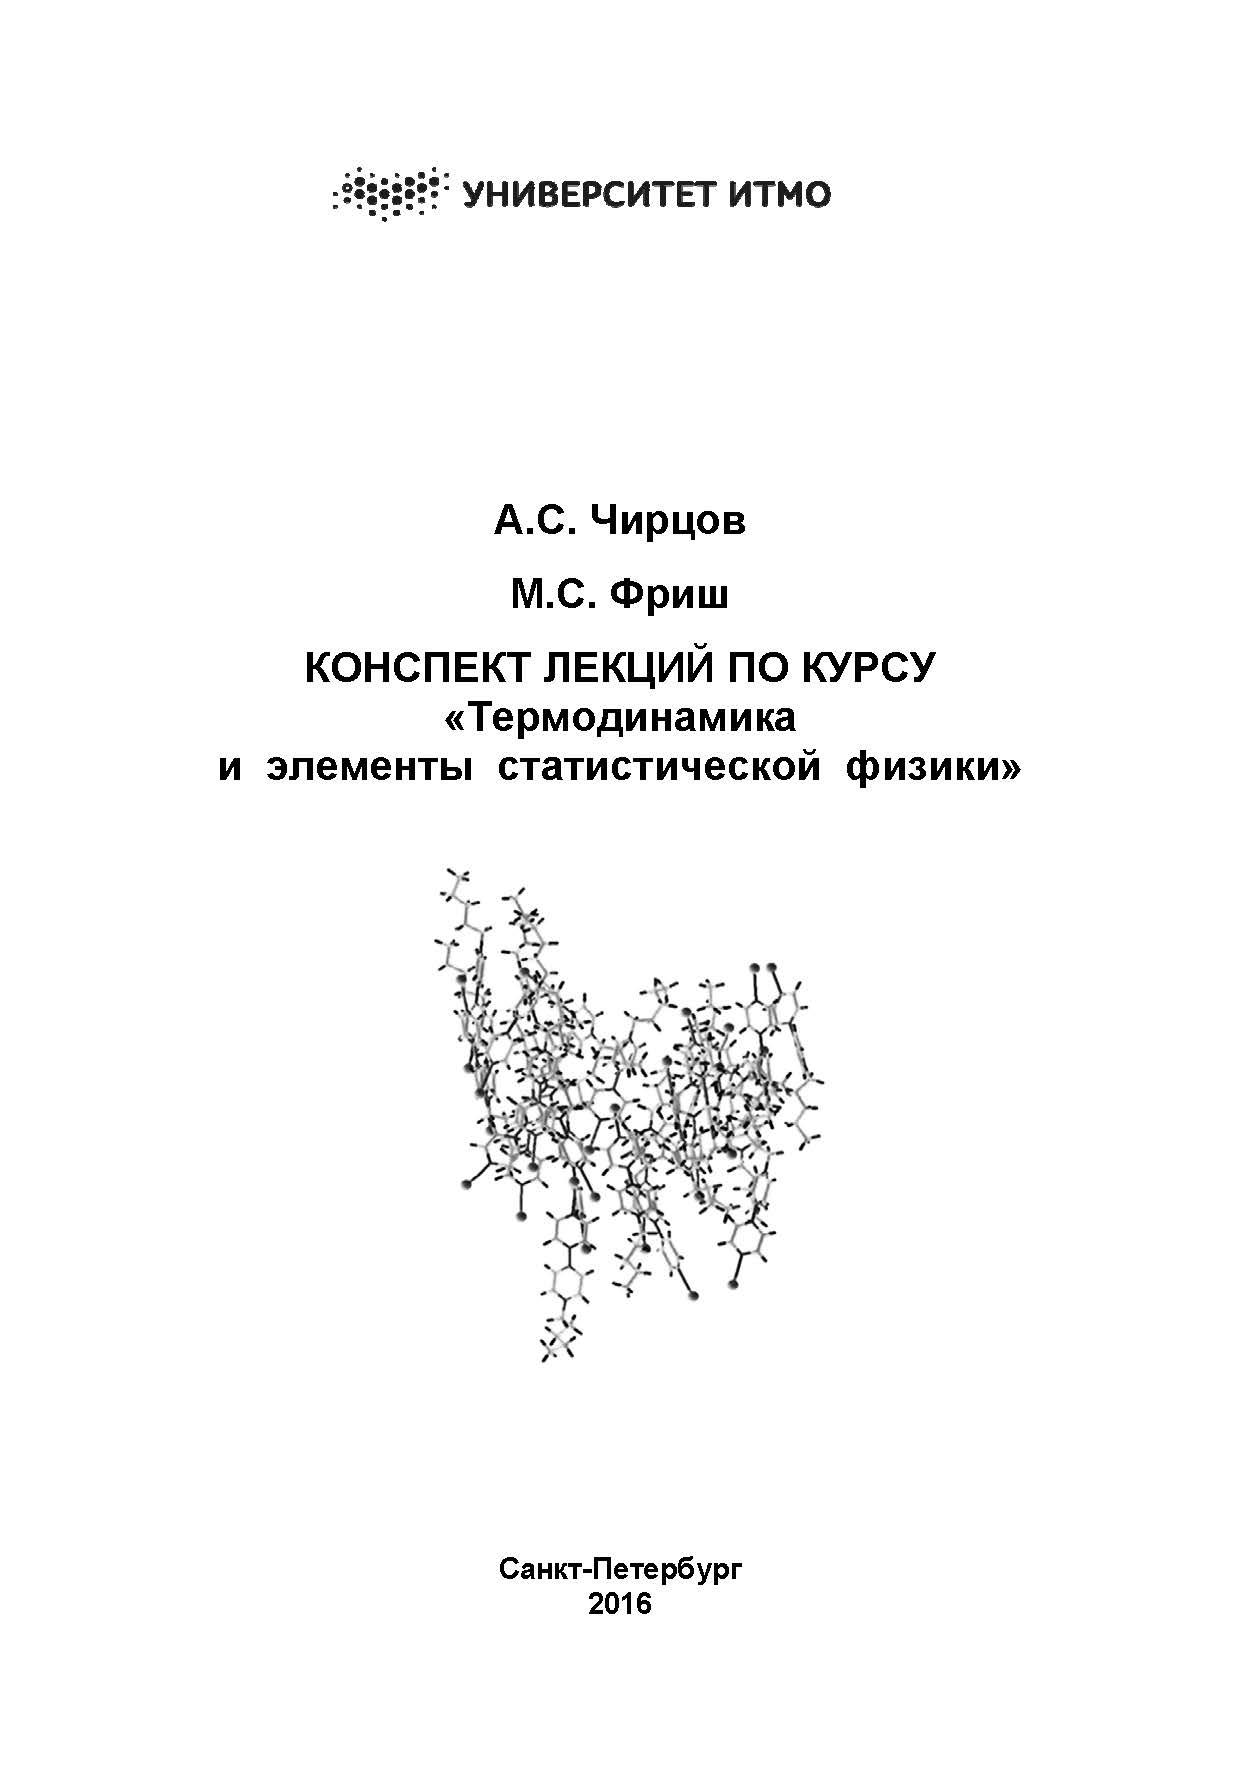 kurs-lektsiy-po-tehnicheskoy-termodinamike